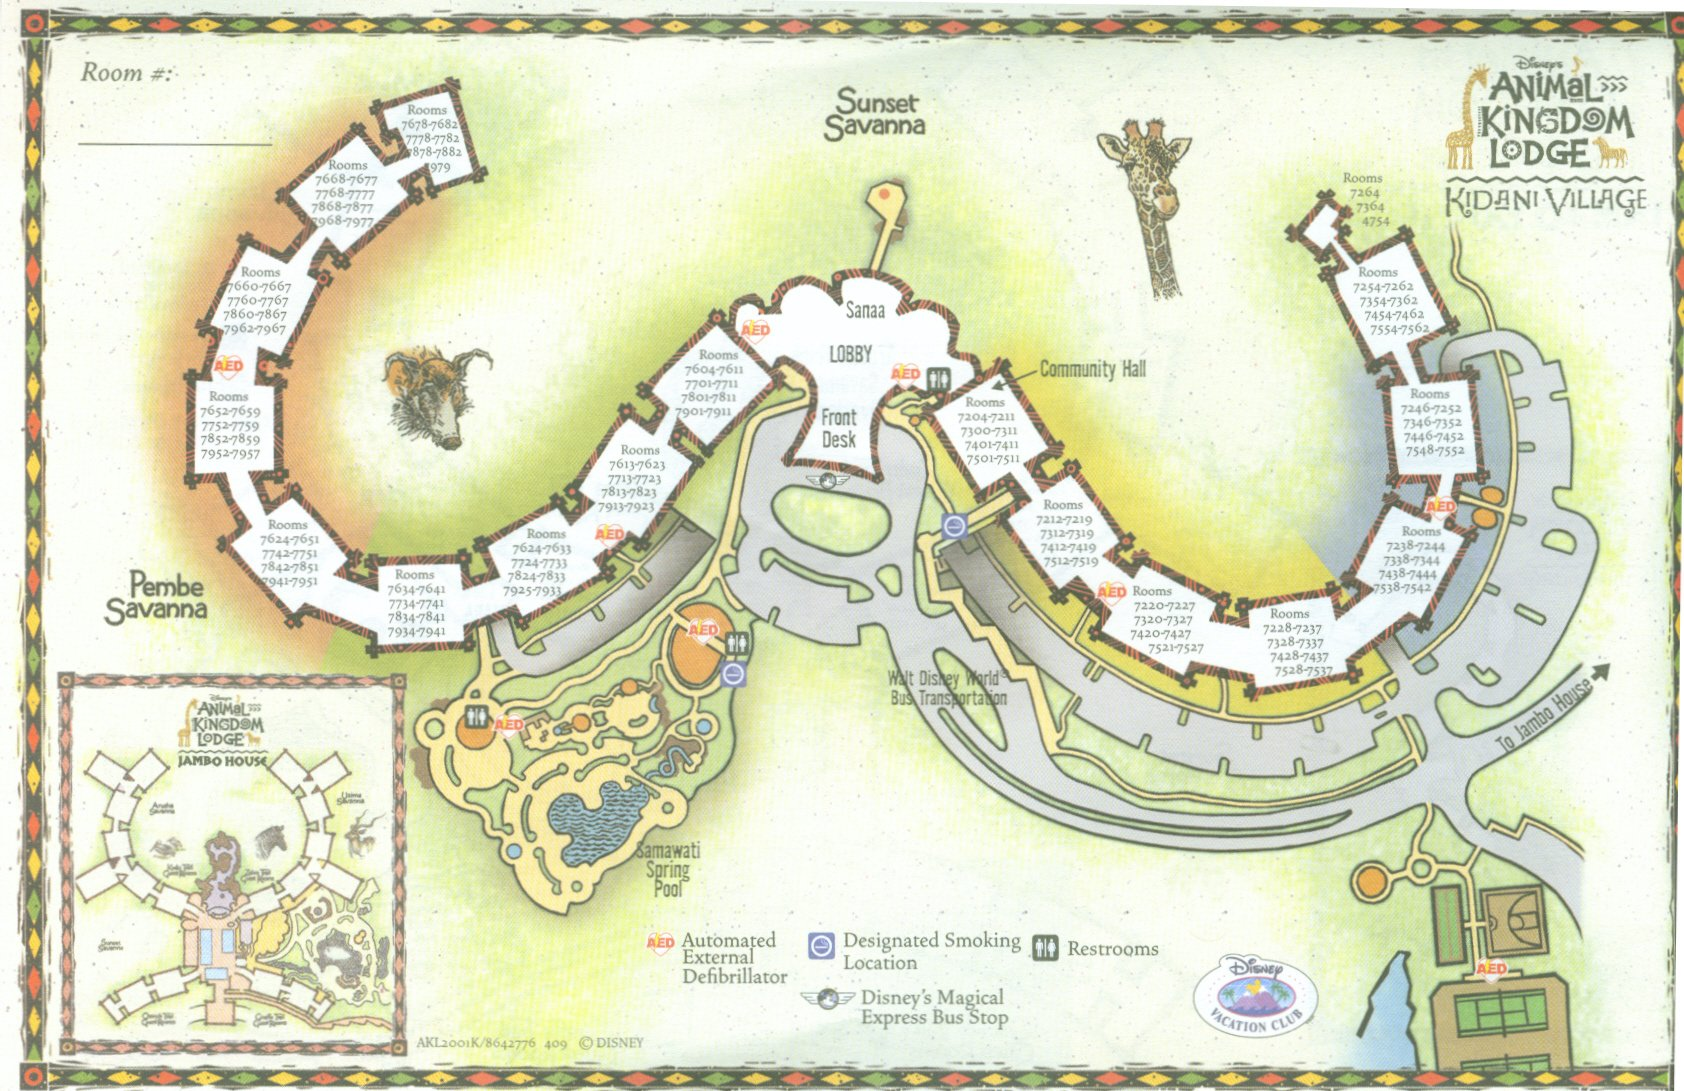 Animal Kingdom Lodge Villas at Walt Disney World Resort - wdwinfo.com